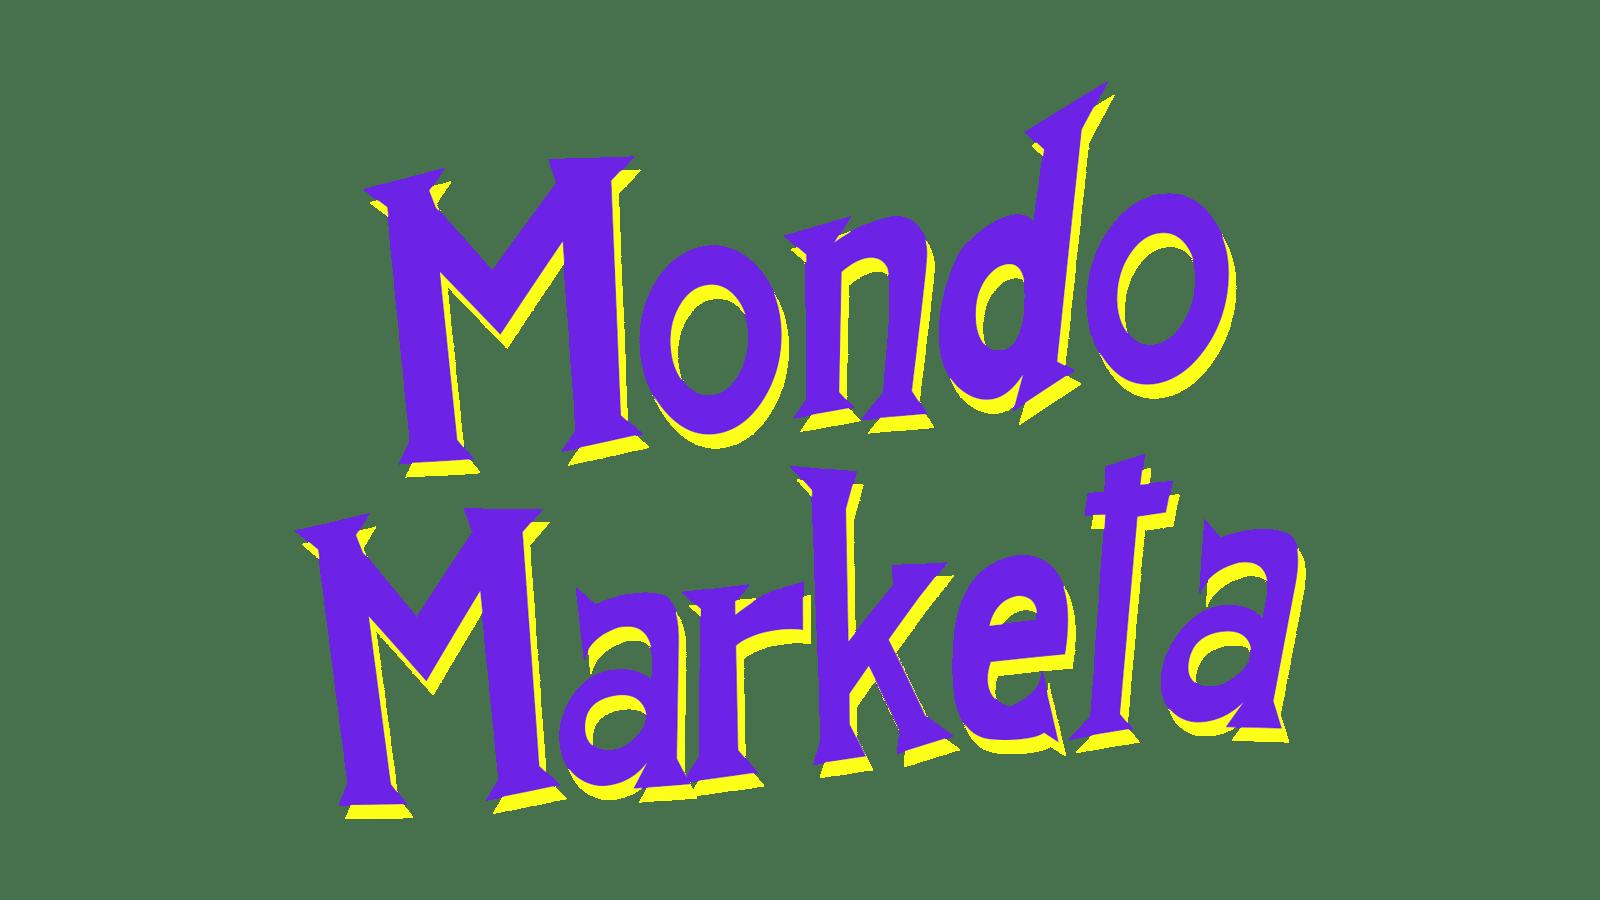 mondo marketa's account image